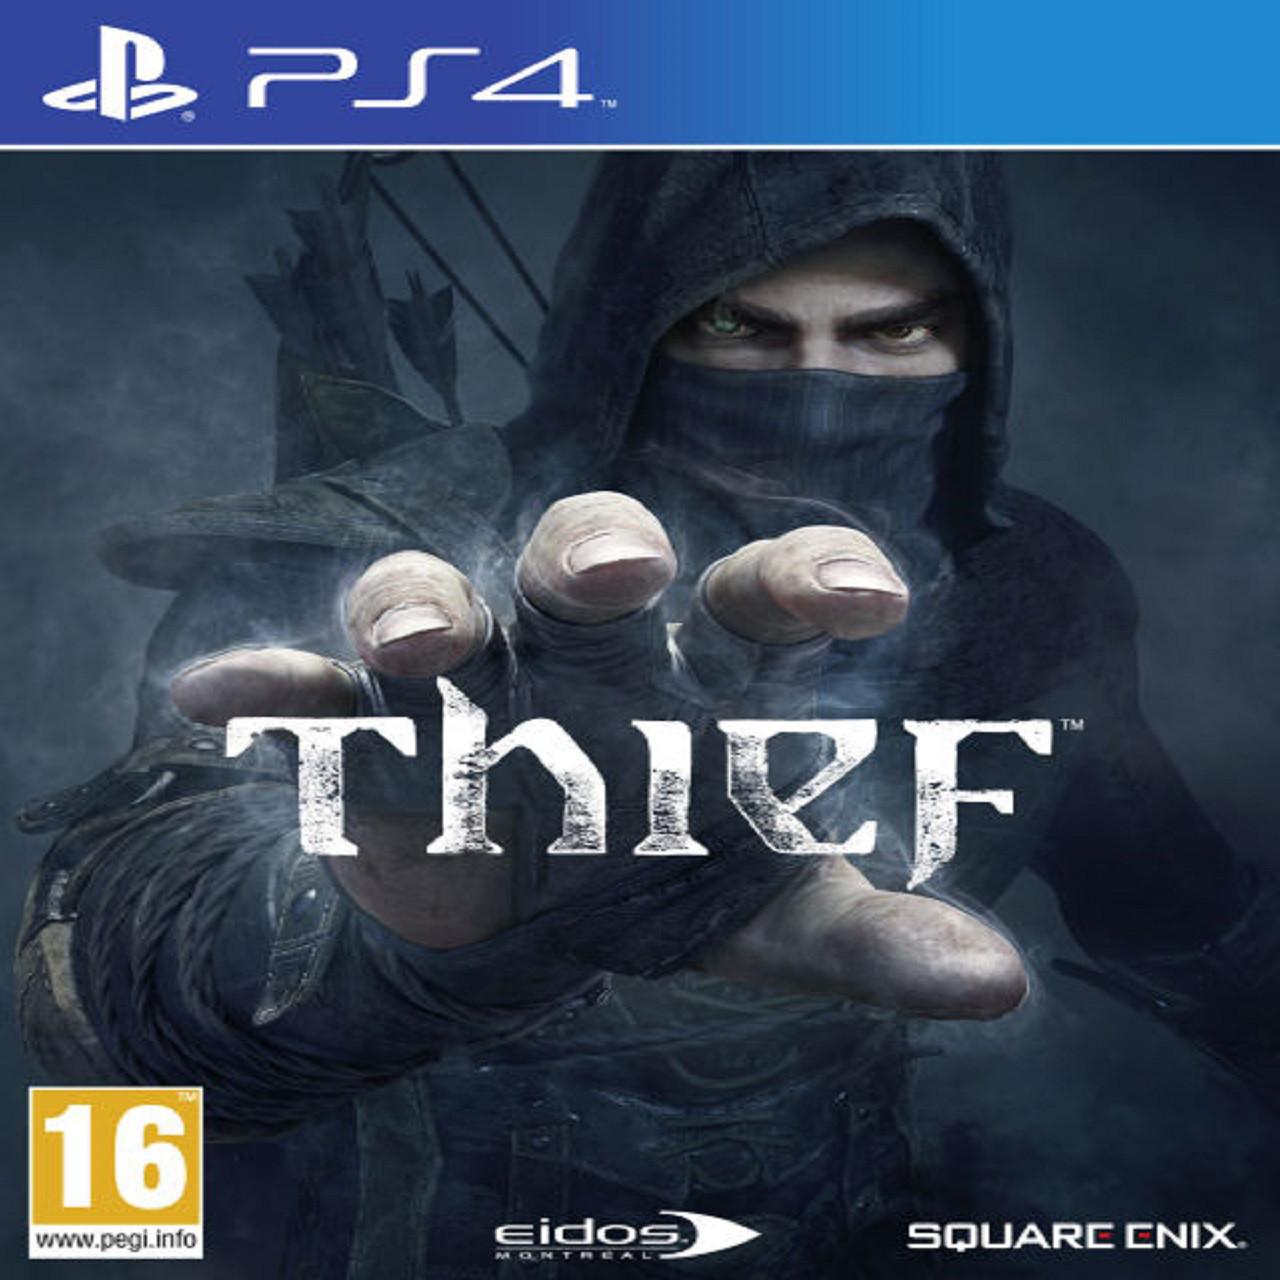 Thief (Stealbook) RUS PS4 (Б/В)